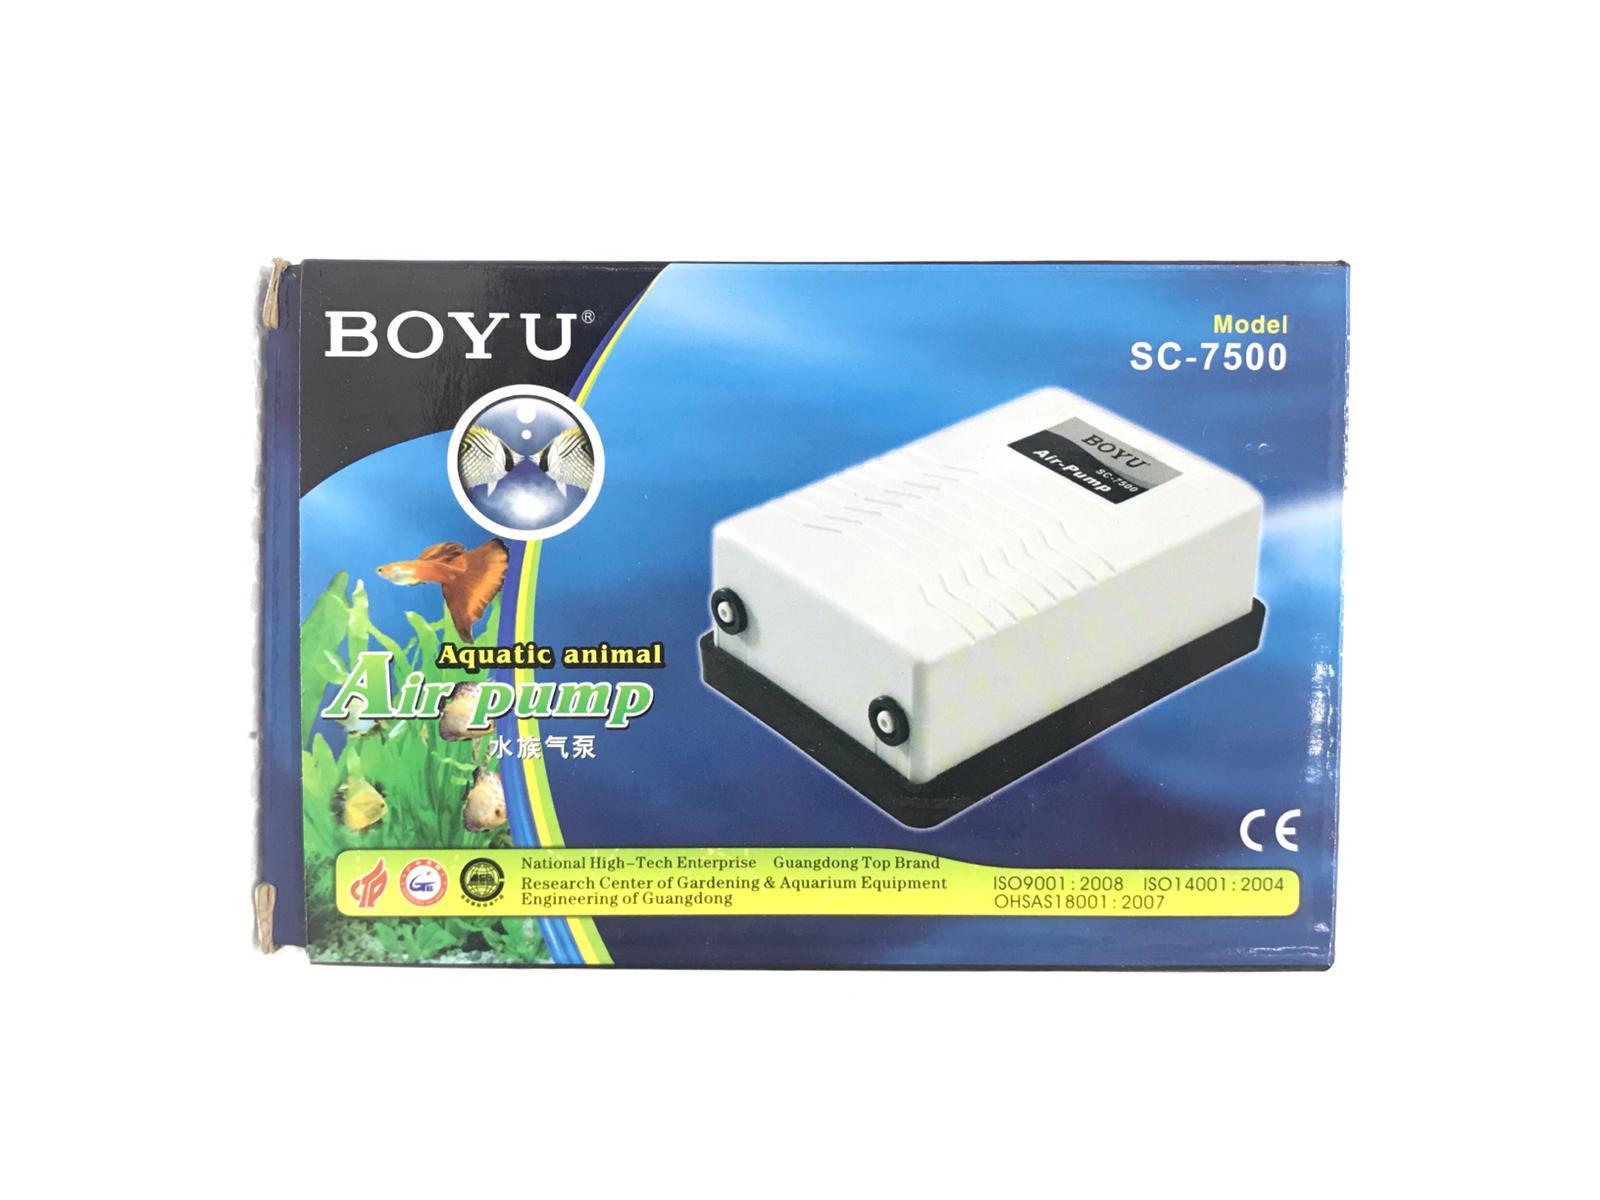 Boyu Aquatic Animal Air Pump SC-7500